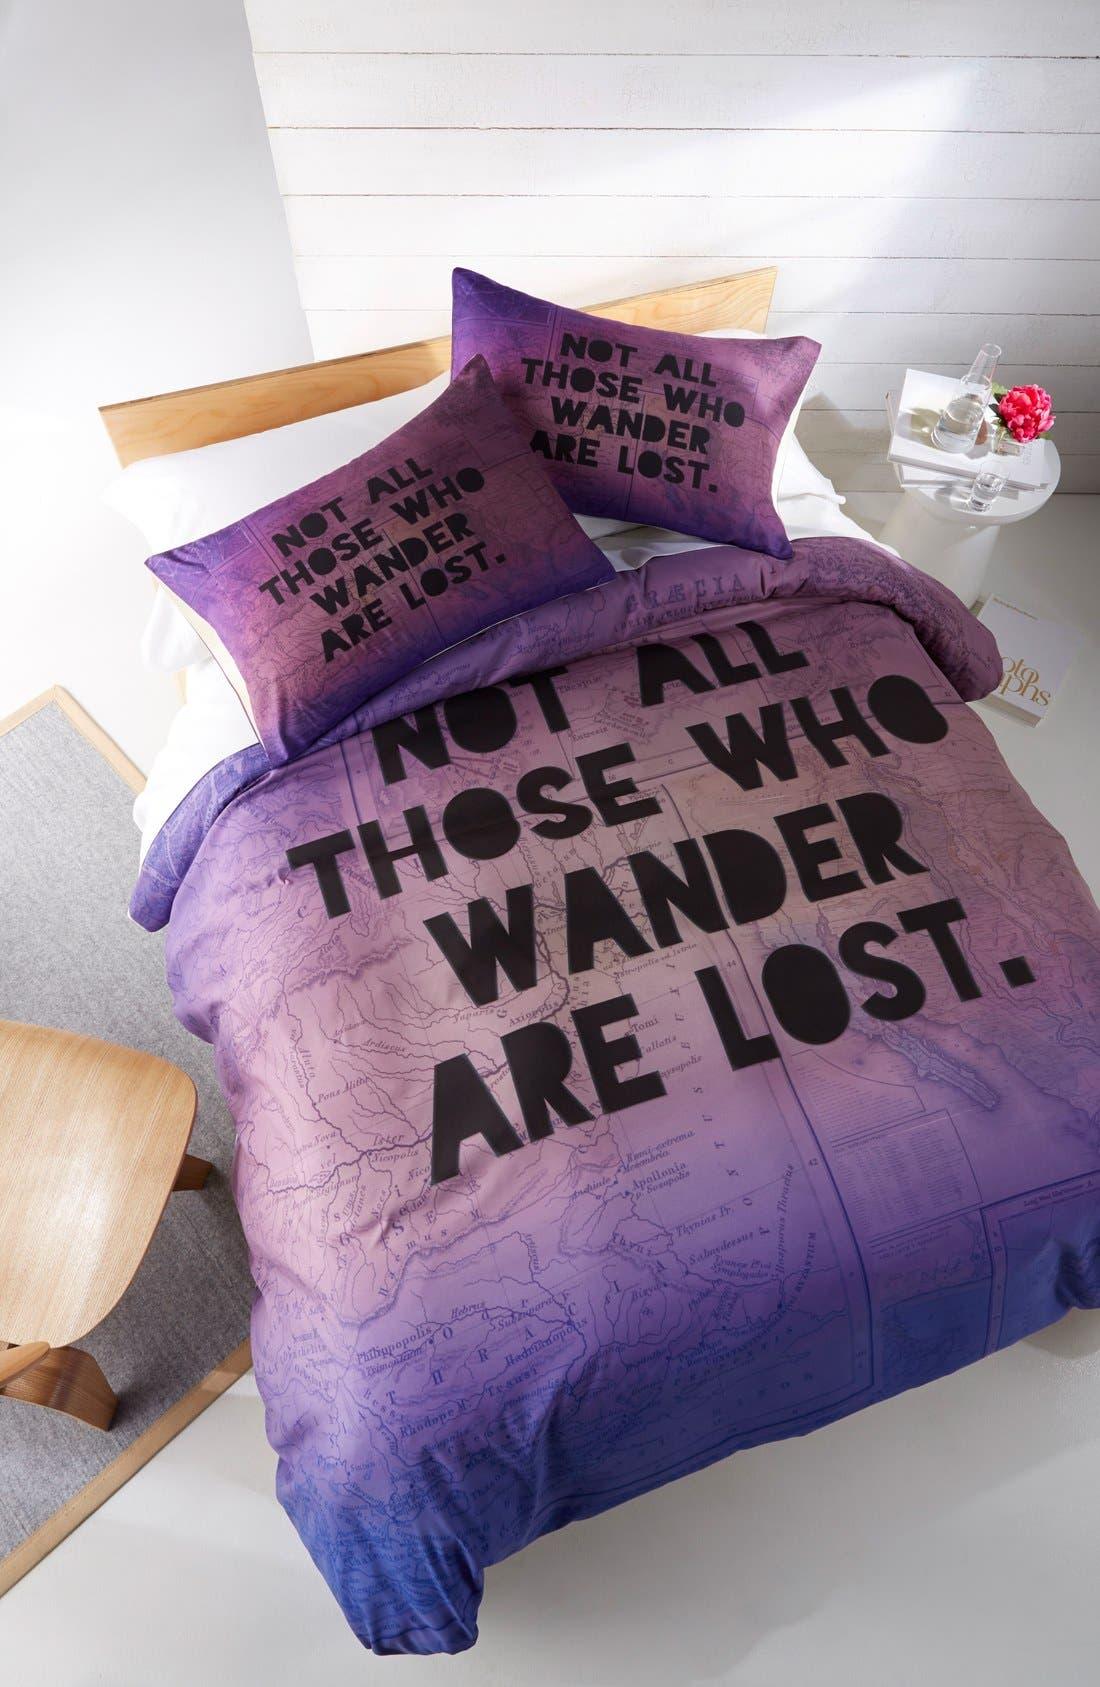 Main Image - DENY Designs 'Those Who Wander' Duvet Cover Set